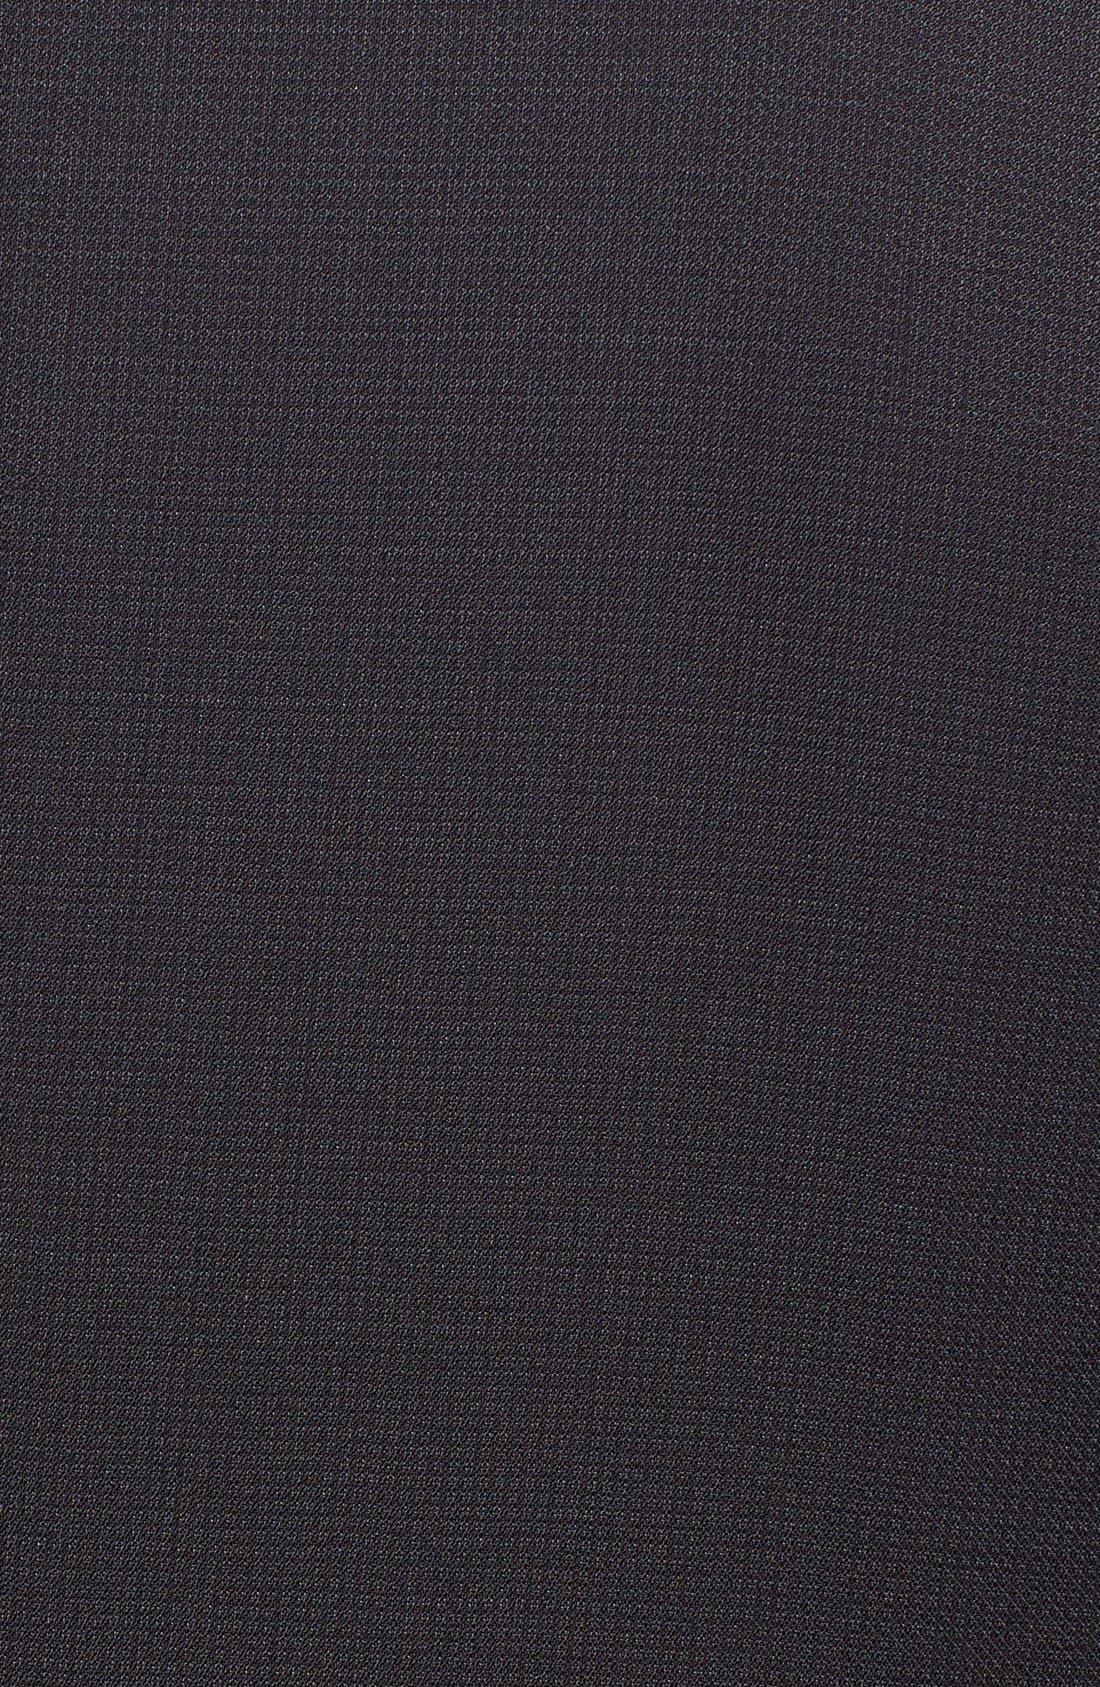 'Huge/Genius' Trim Fit Solid Wool Suit,                             Alternate thumbnail 16, color,                             BLACK